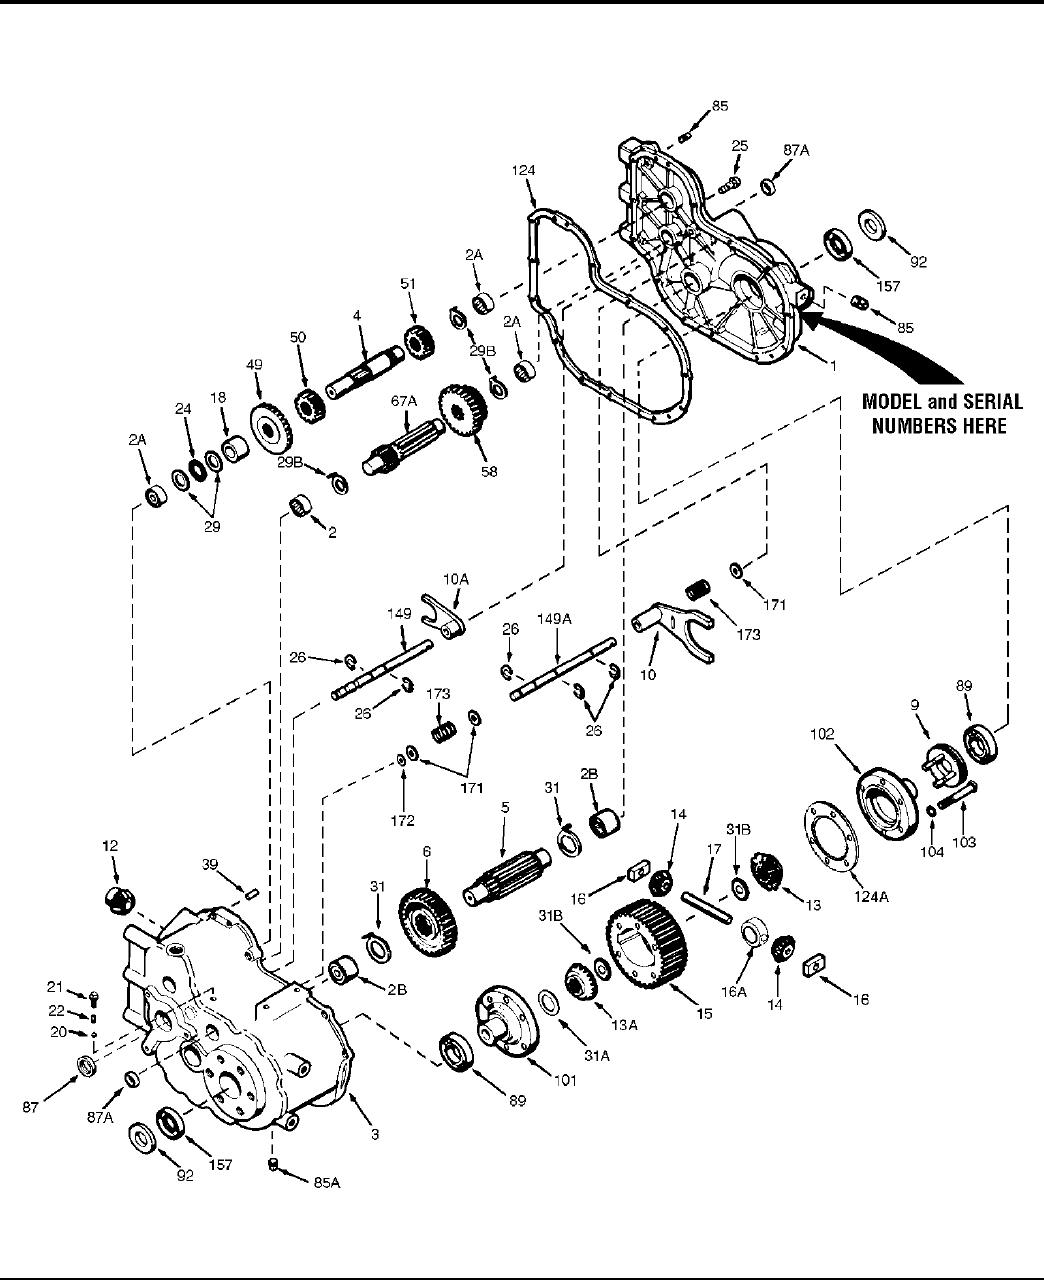 hight resolution of simplicity lecacy parts manual partsmanual png 1044x1280 tecumseh peerless transaxle parts diagram